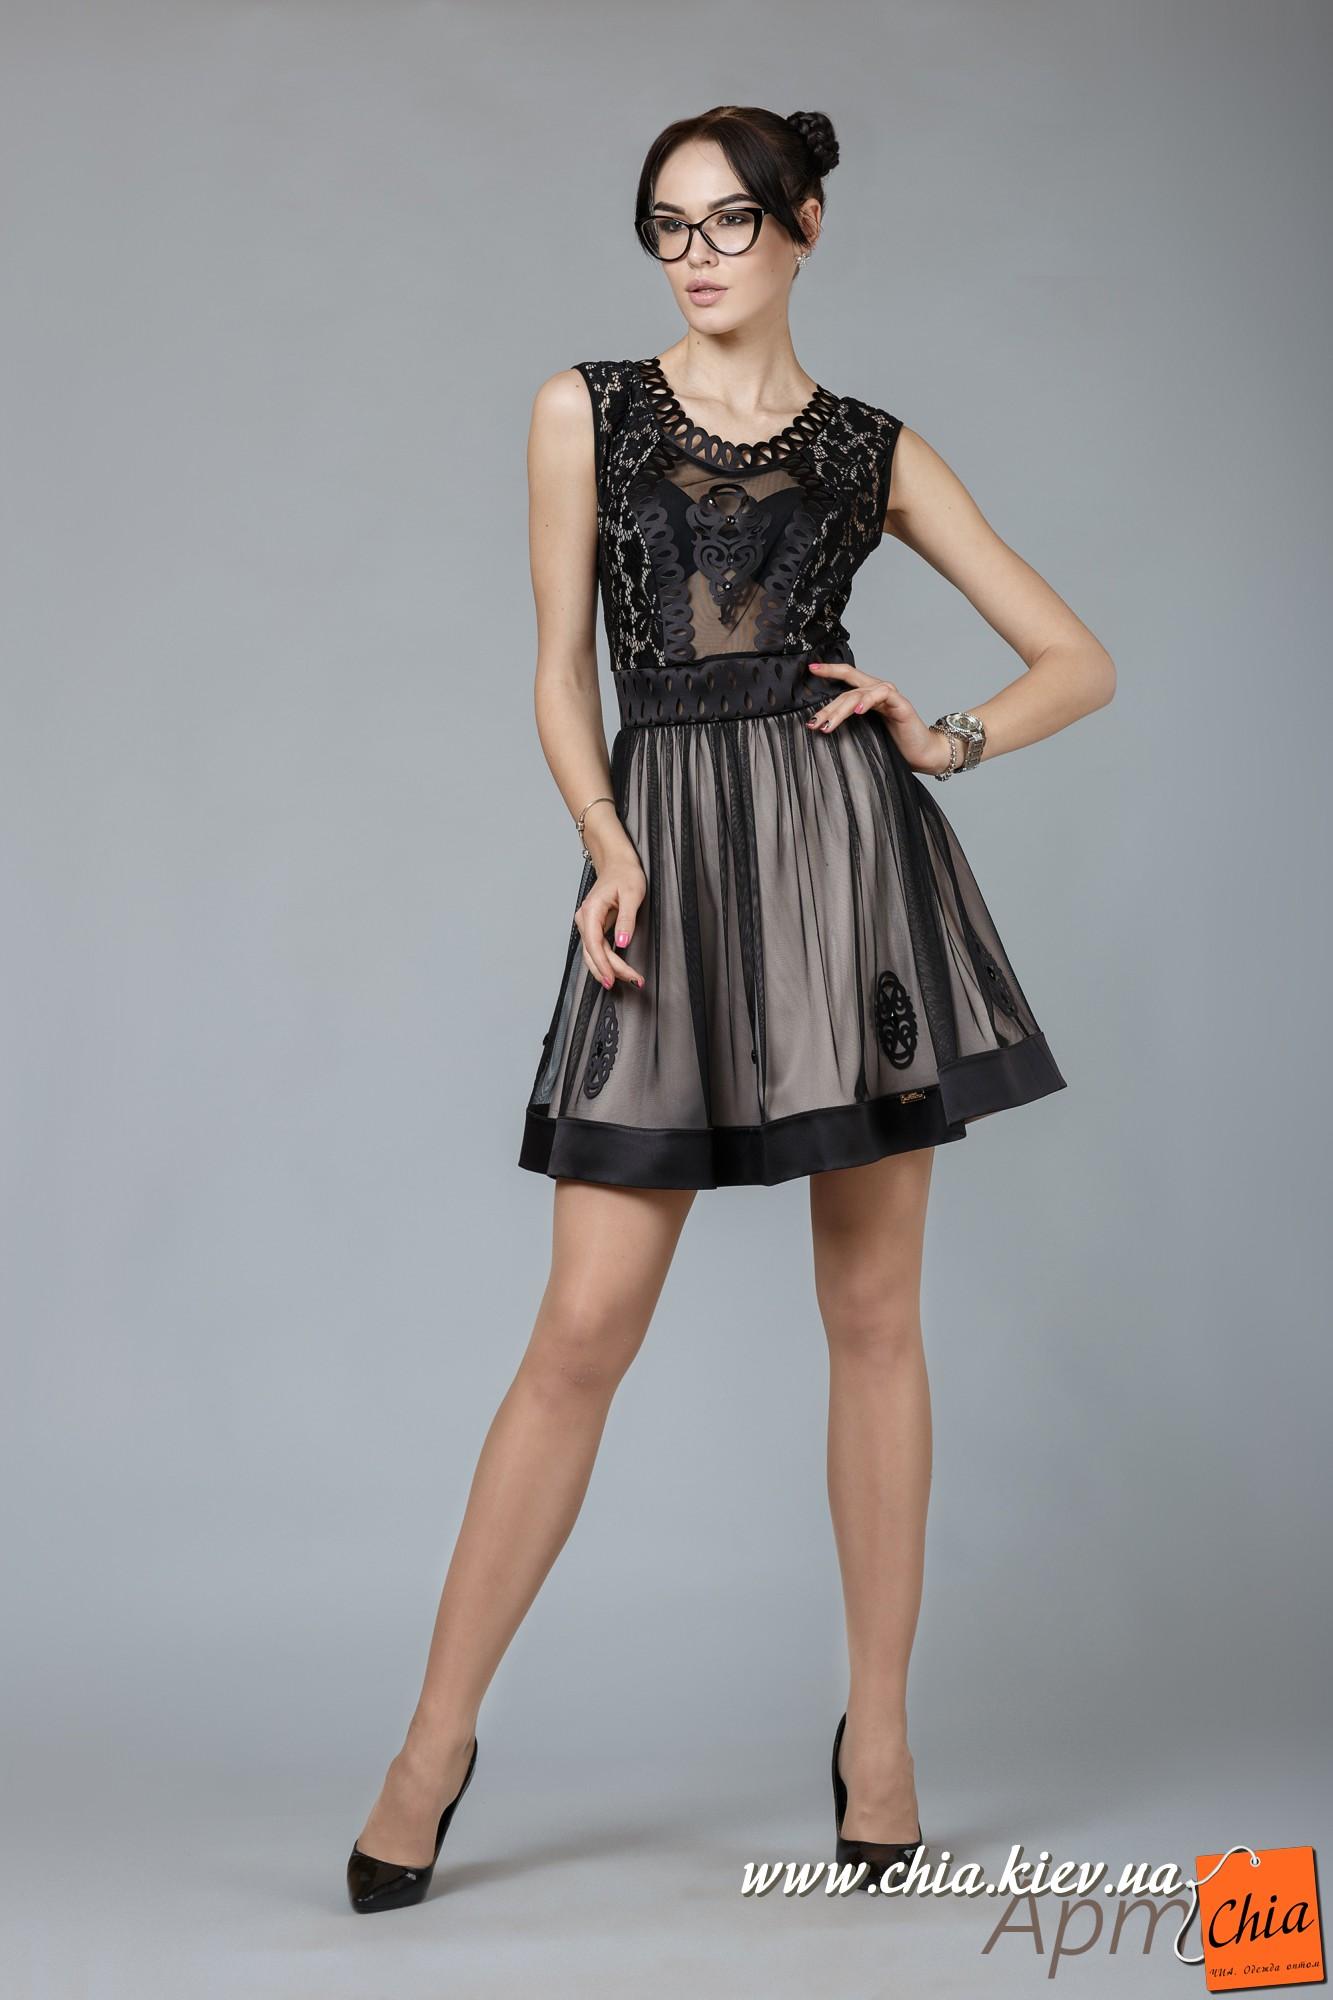 Angel provocation платья